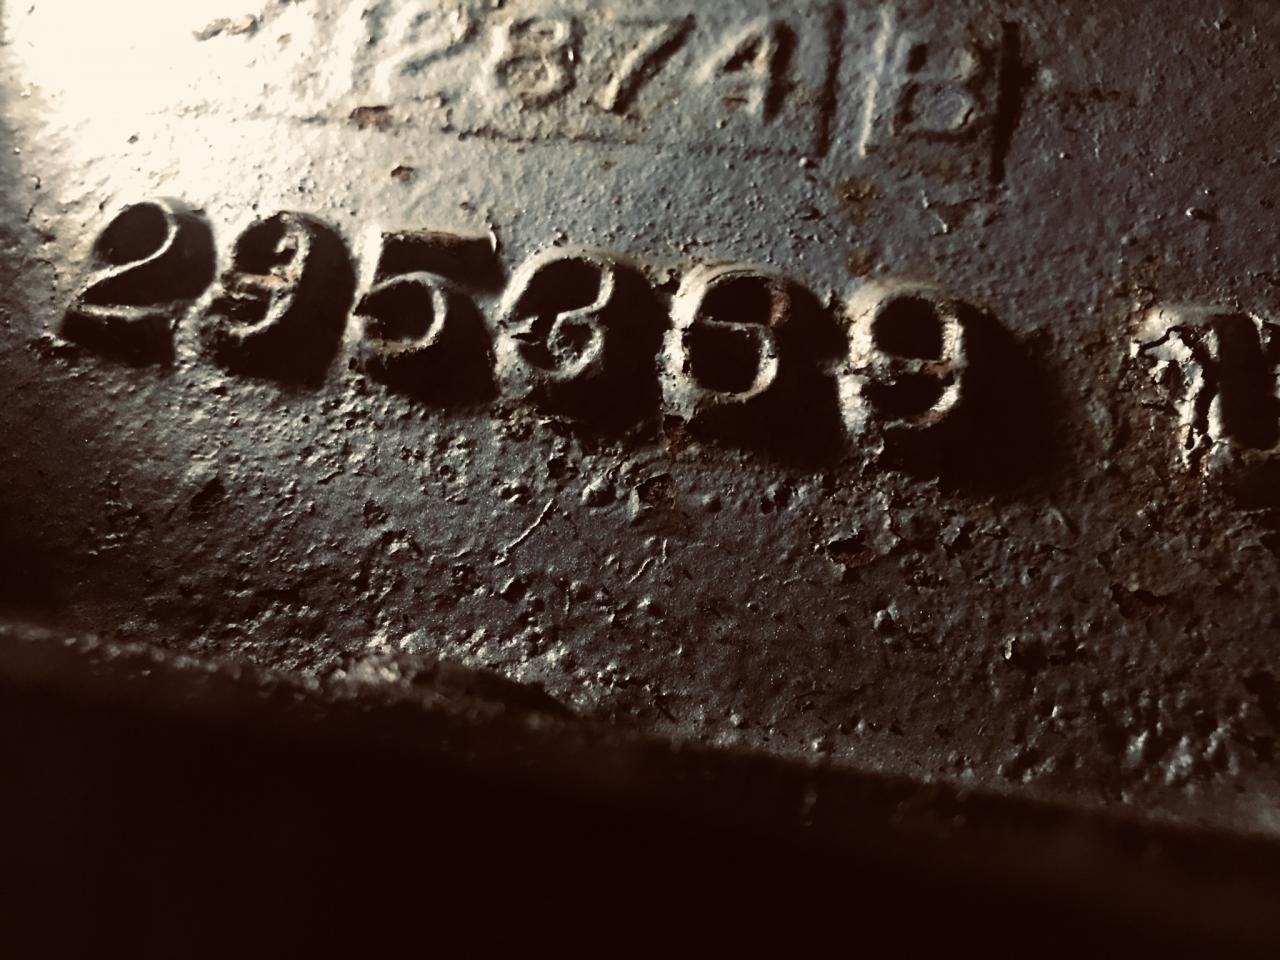 Name:  BECEE7FB-C2CD-4057-BACC-E69BD1DC8F9A.jpg Views: 293 Size:  153.3 KB